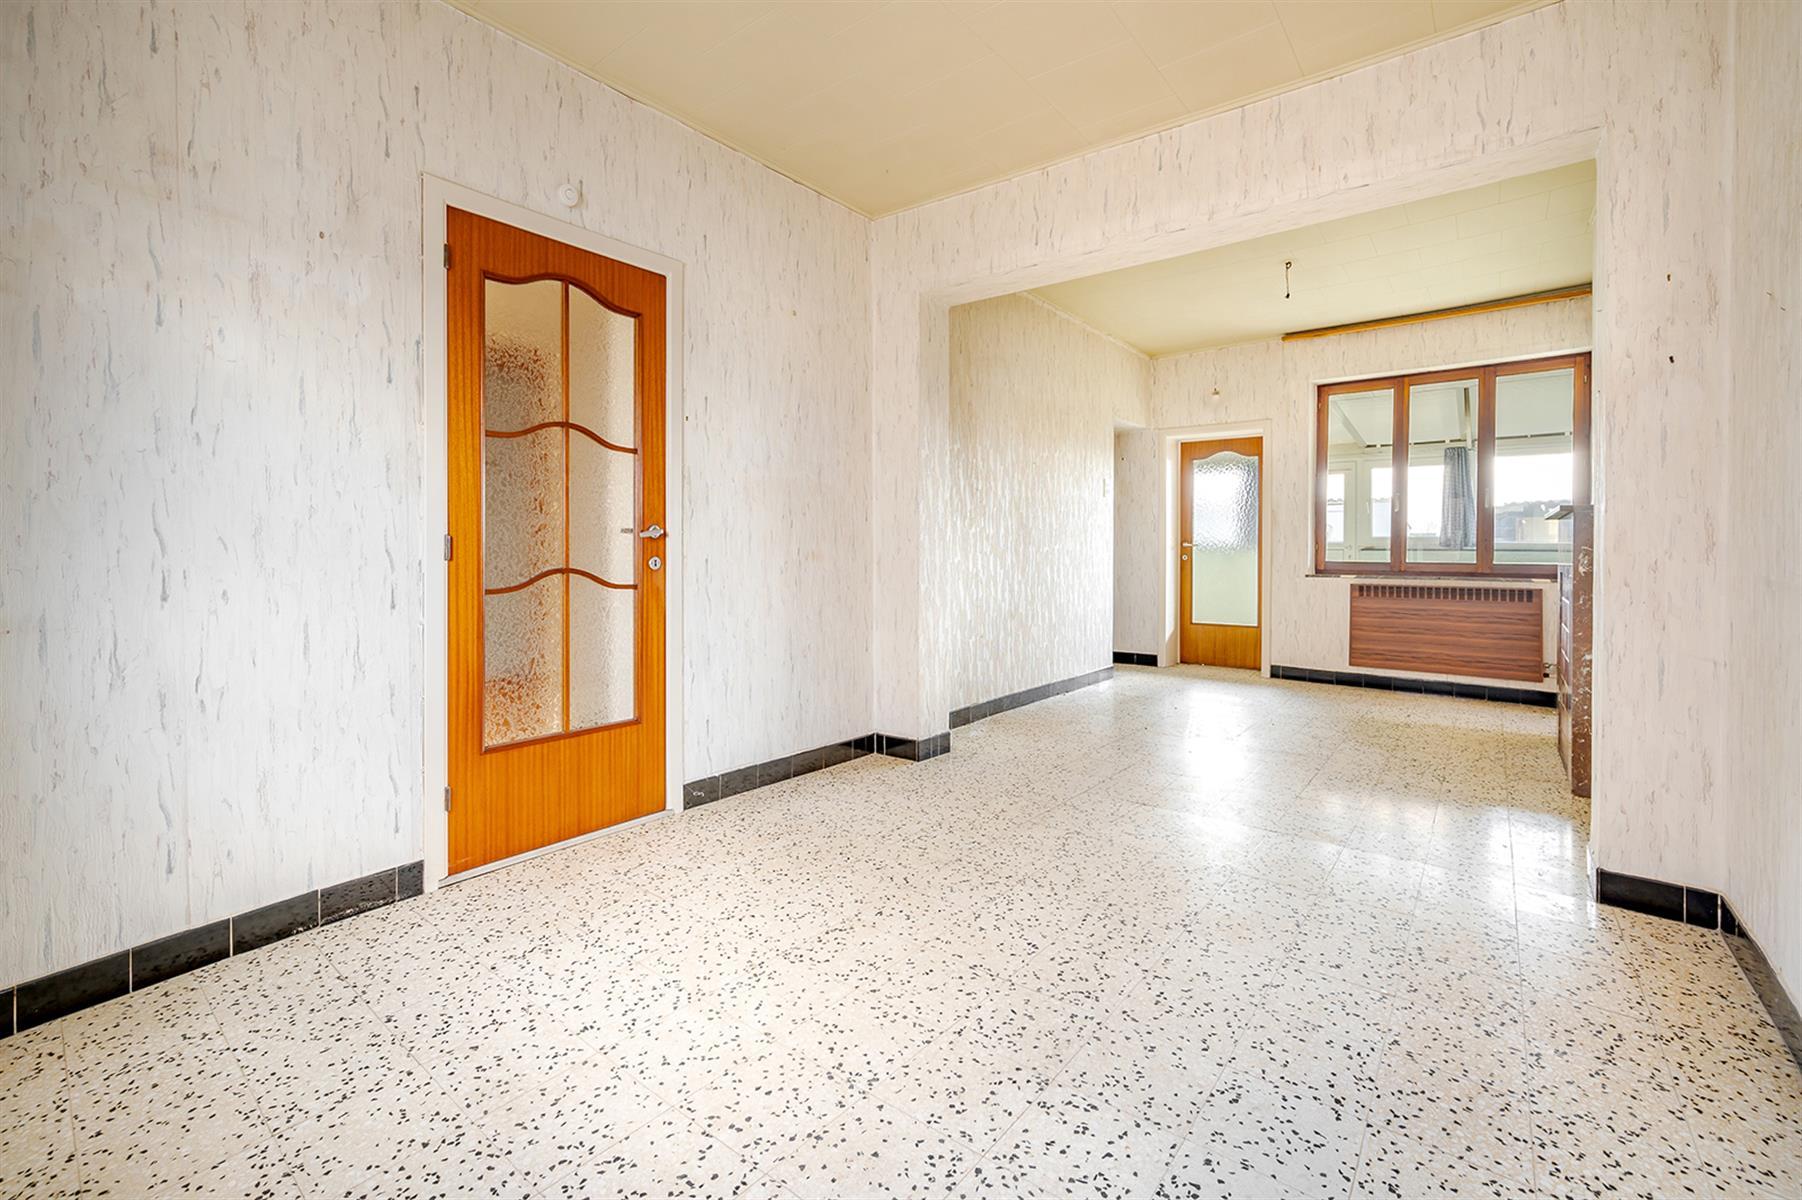 Maison - Remicourt - #4293207-1